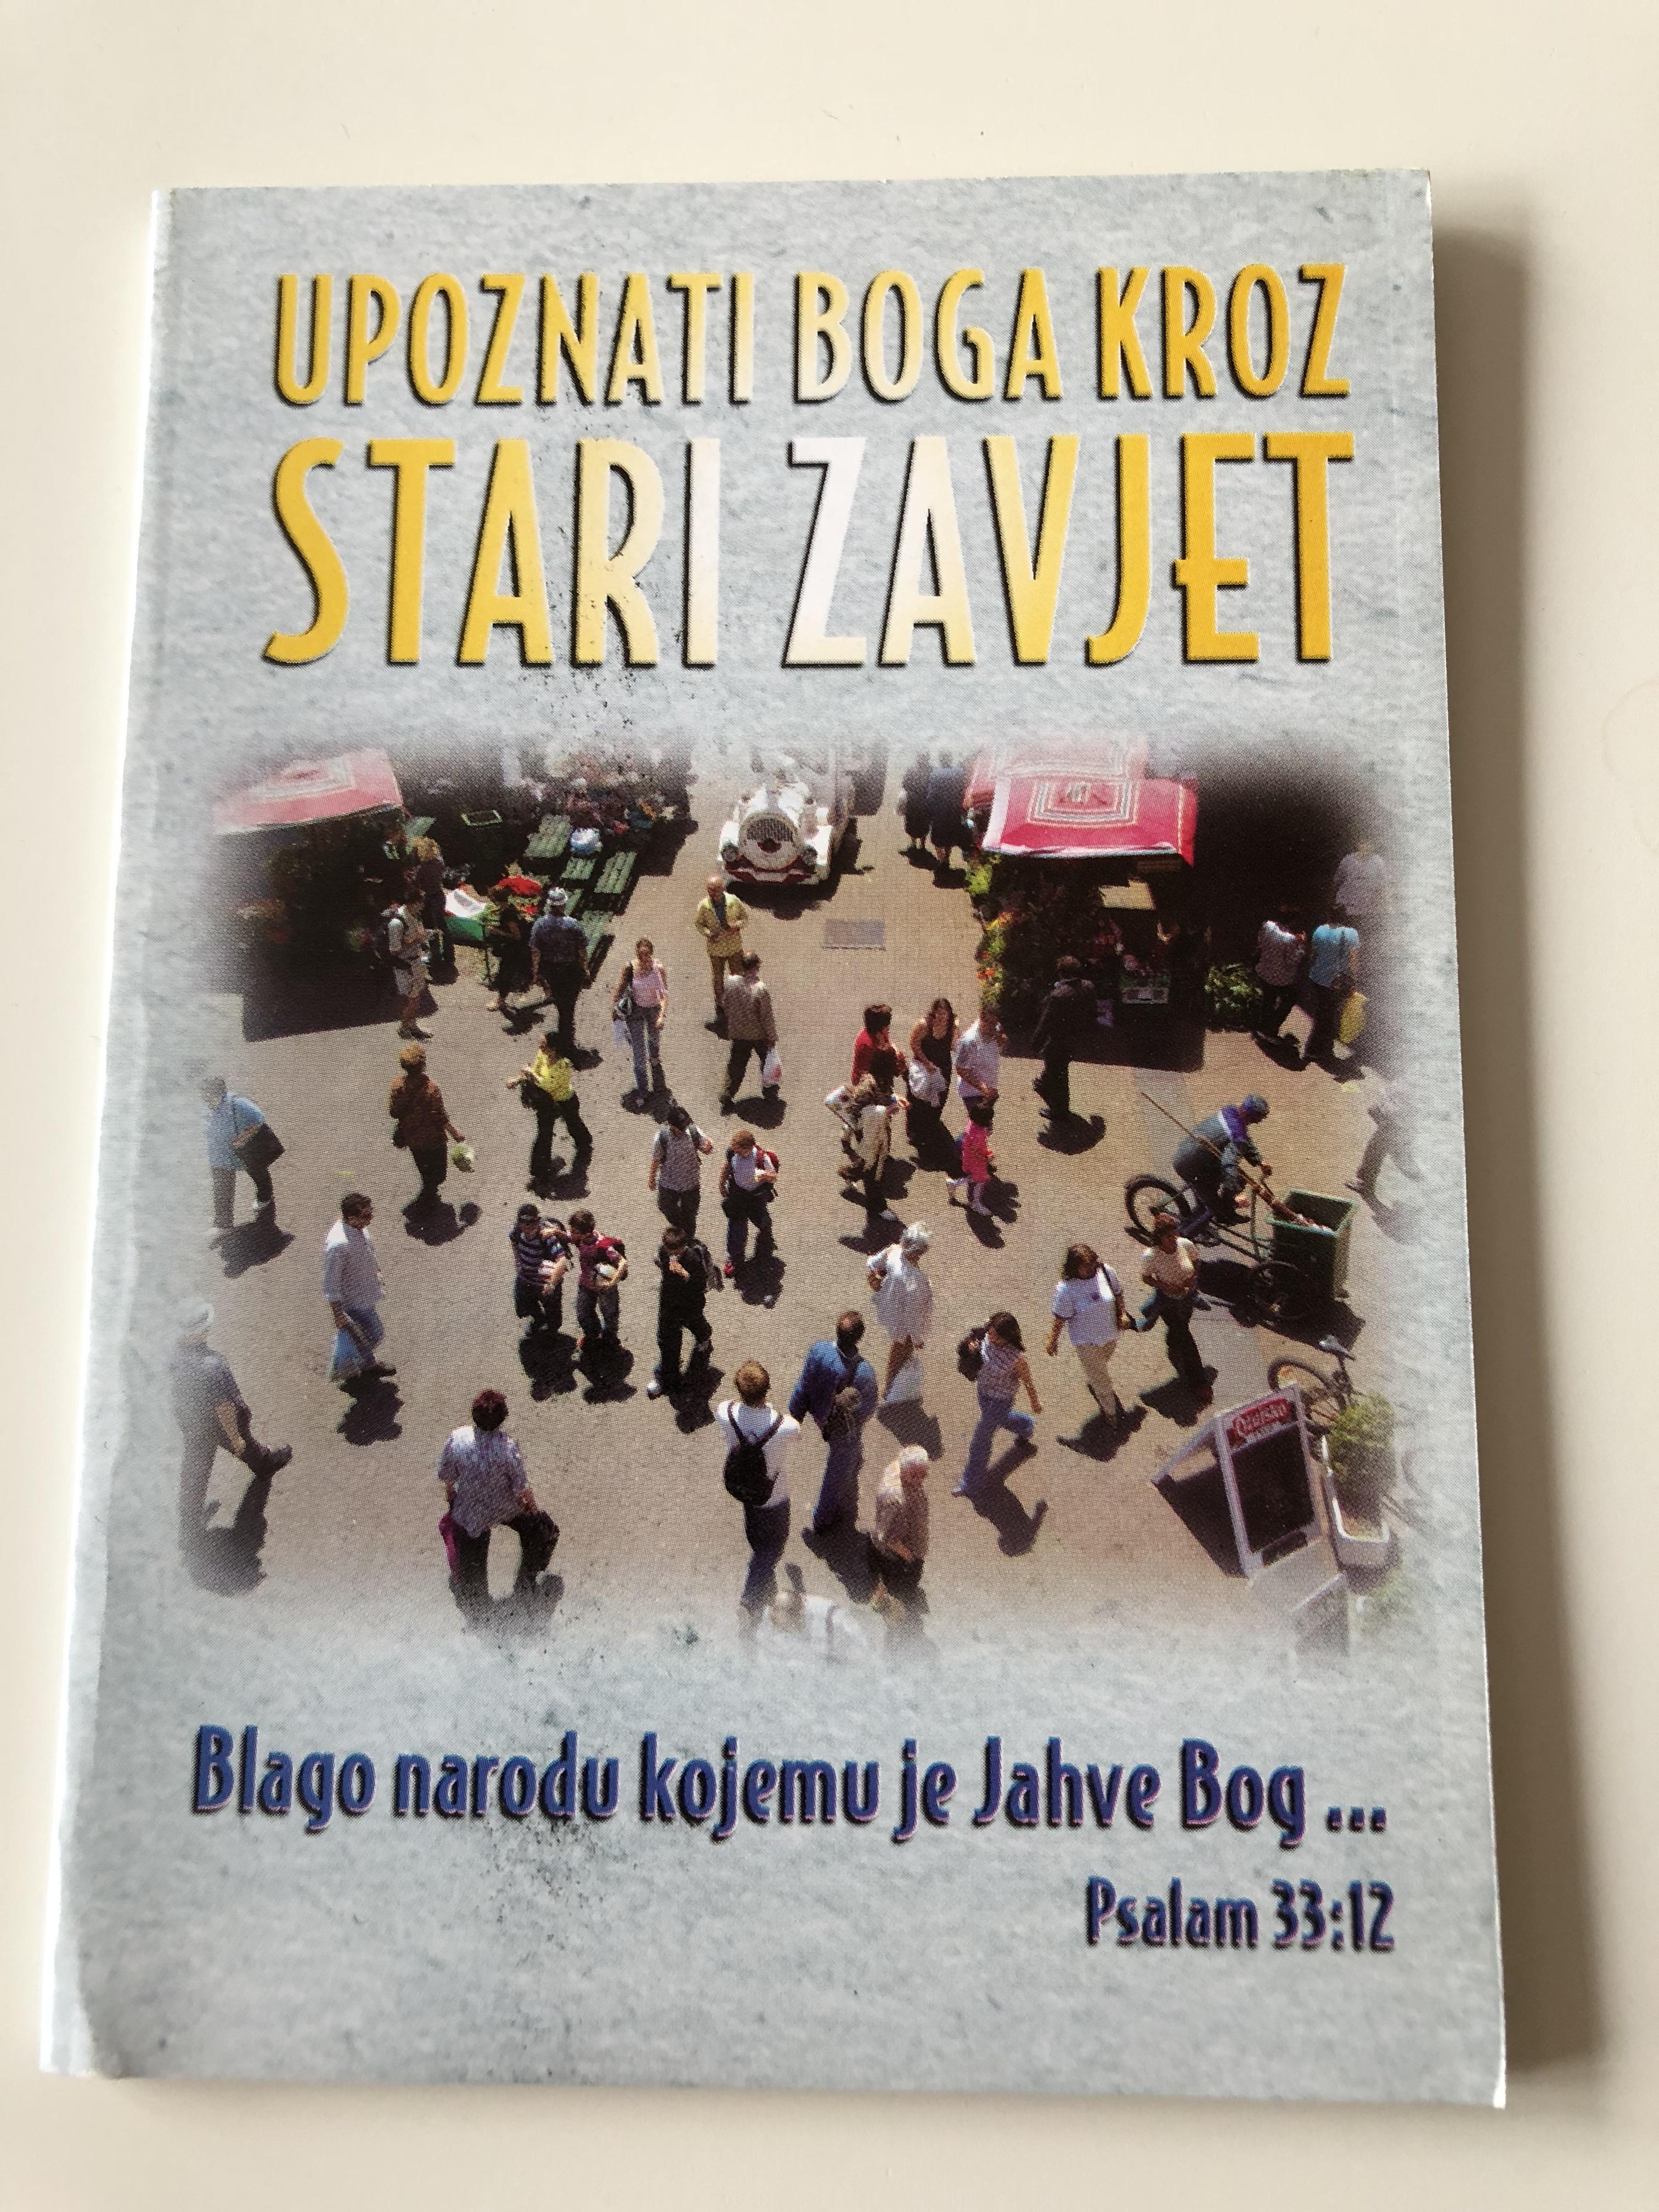 upoznati-boga-kroz-stari-zavjet-croatian-language-booklet-knowing-god-through-the-old-testament-david-egner-paperback-2004-1-.jpg